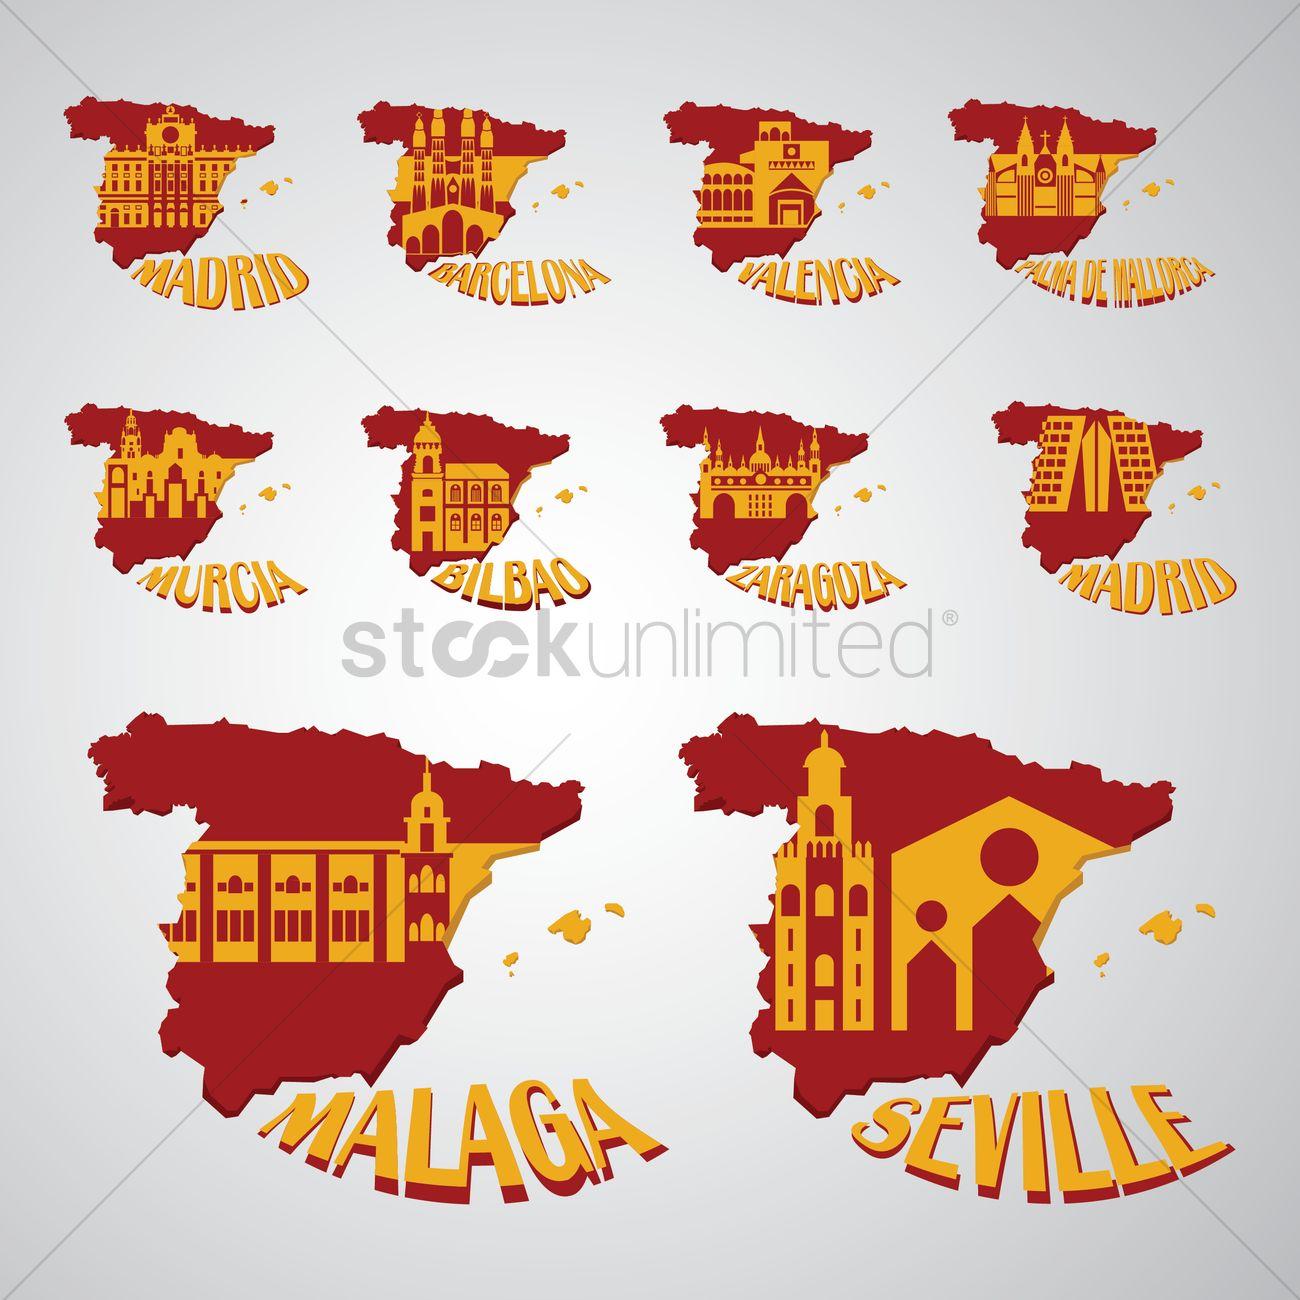 Map Of Spain Landmarks.Set Of Spain Map With Landmarks Vector Image 1564092 Stockunlimited